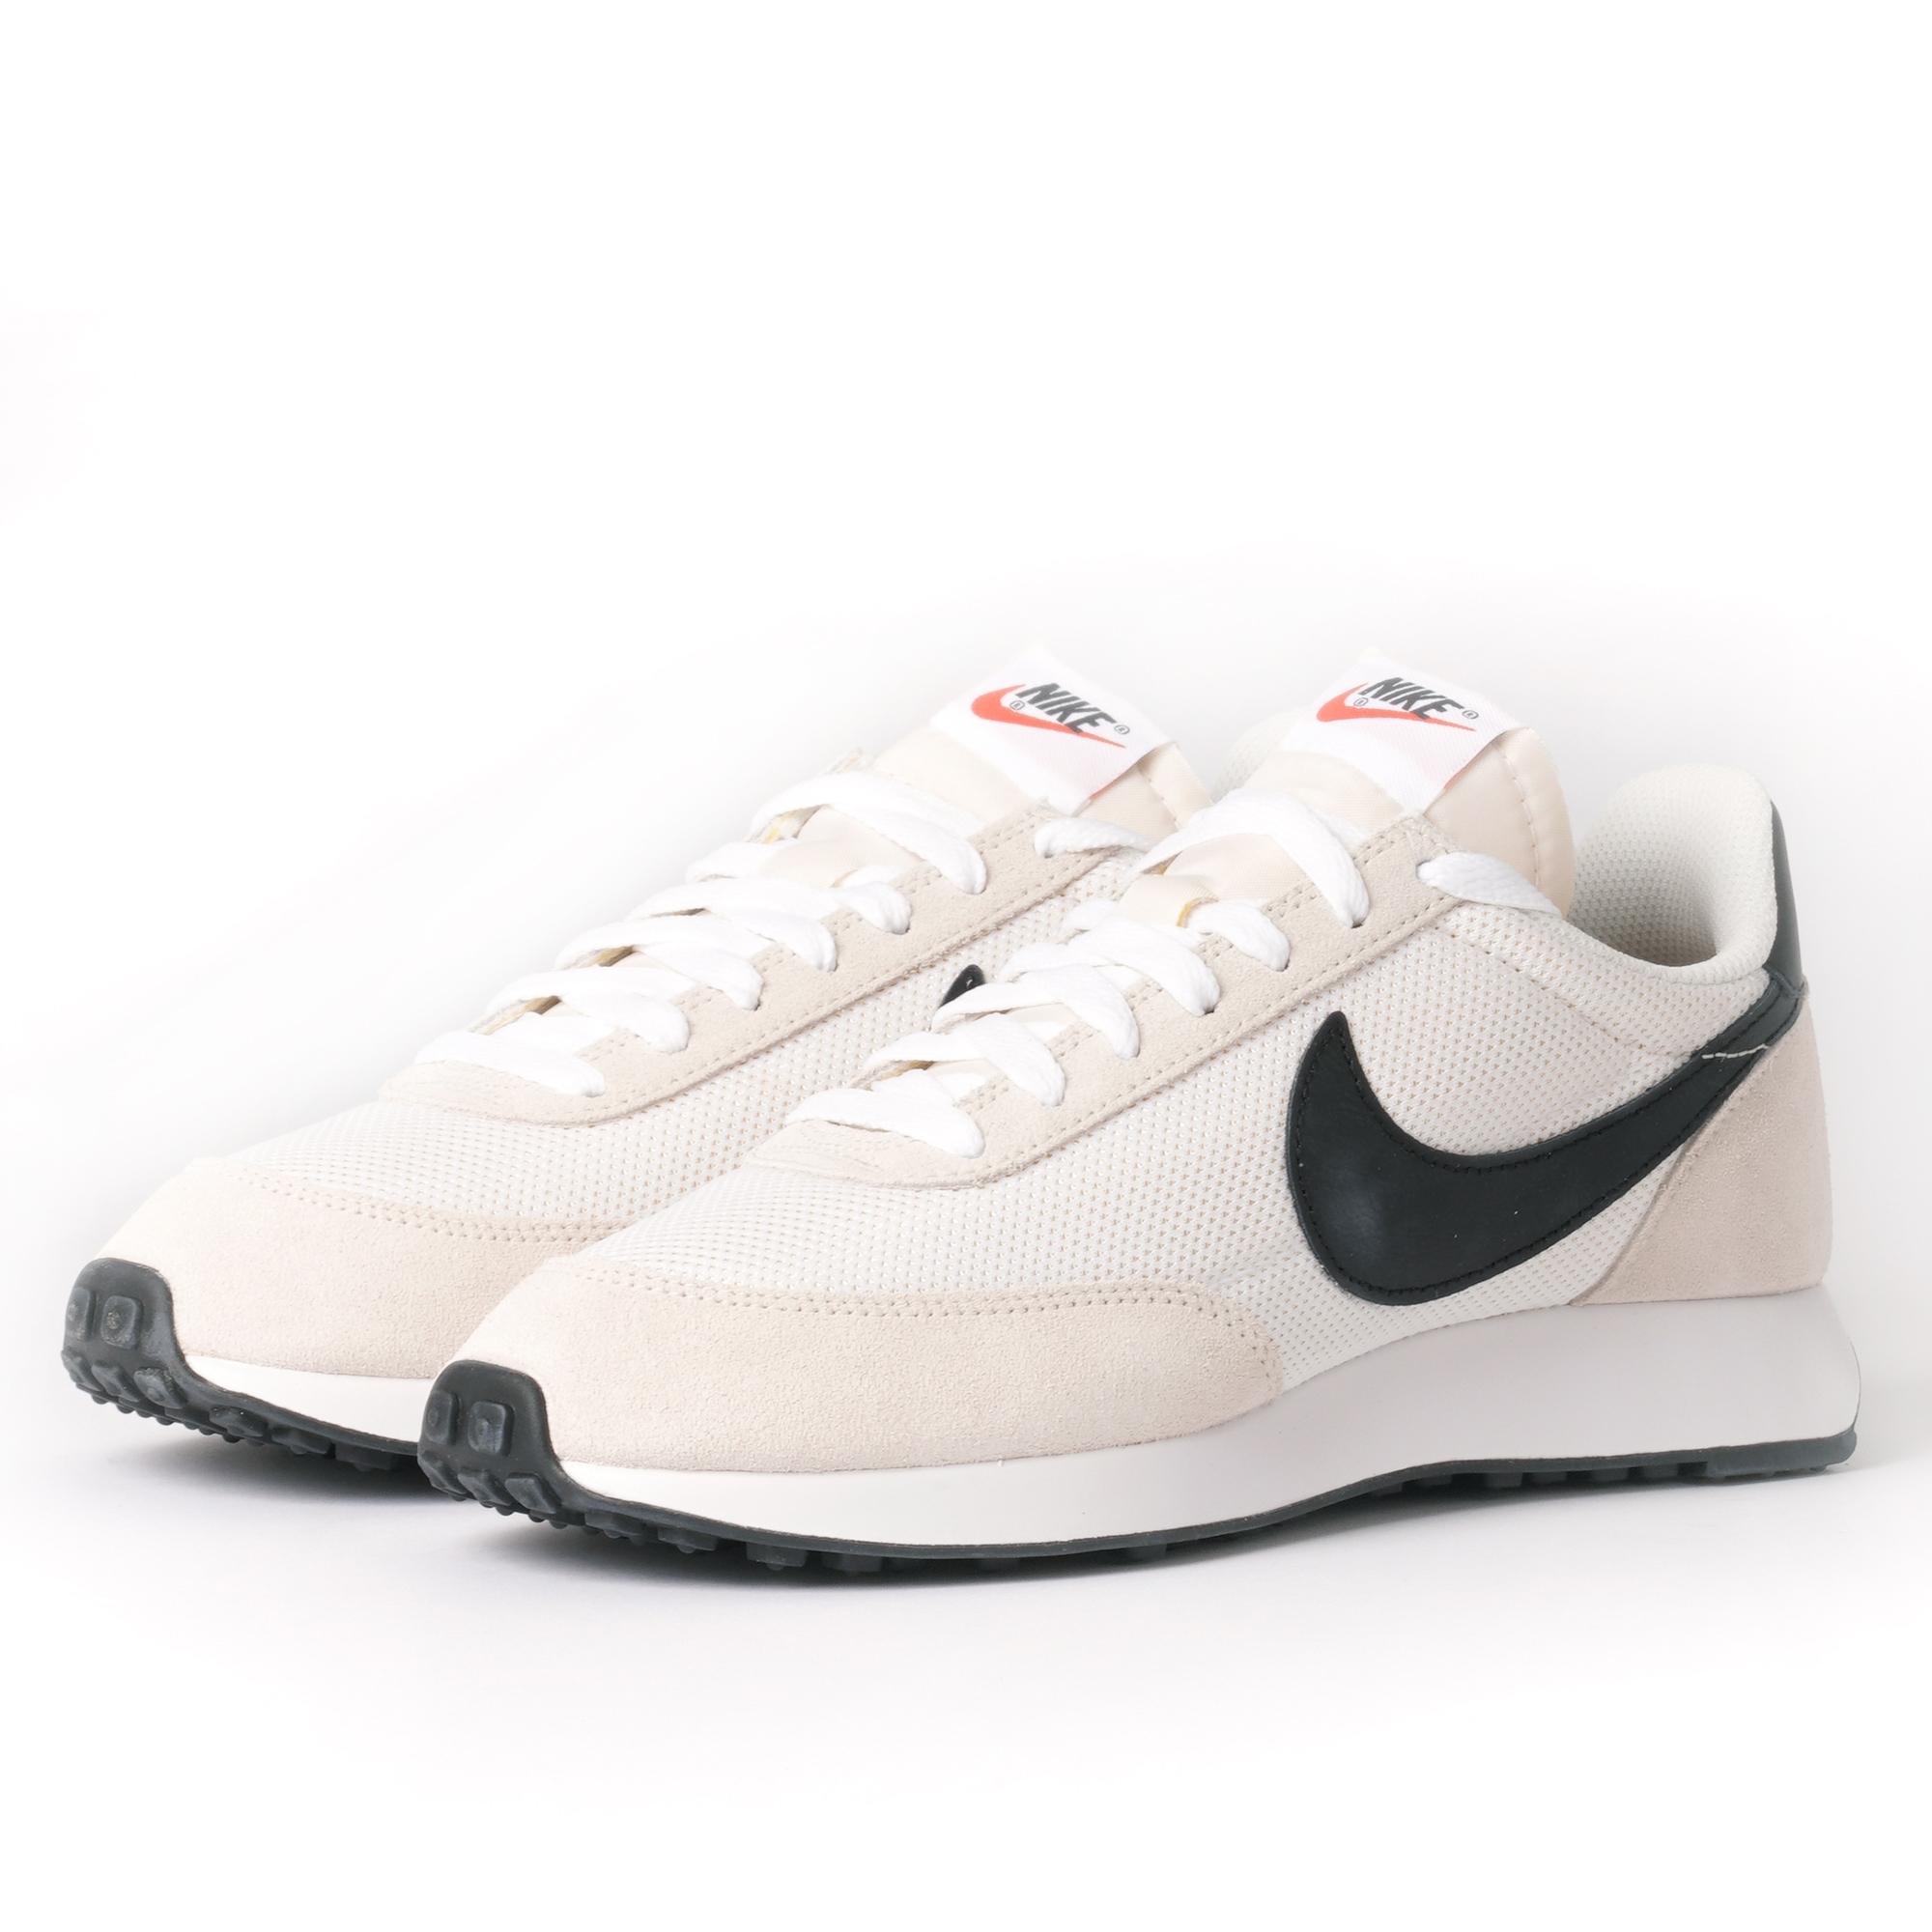 Nike Air Tailwind 79 | White, Black